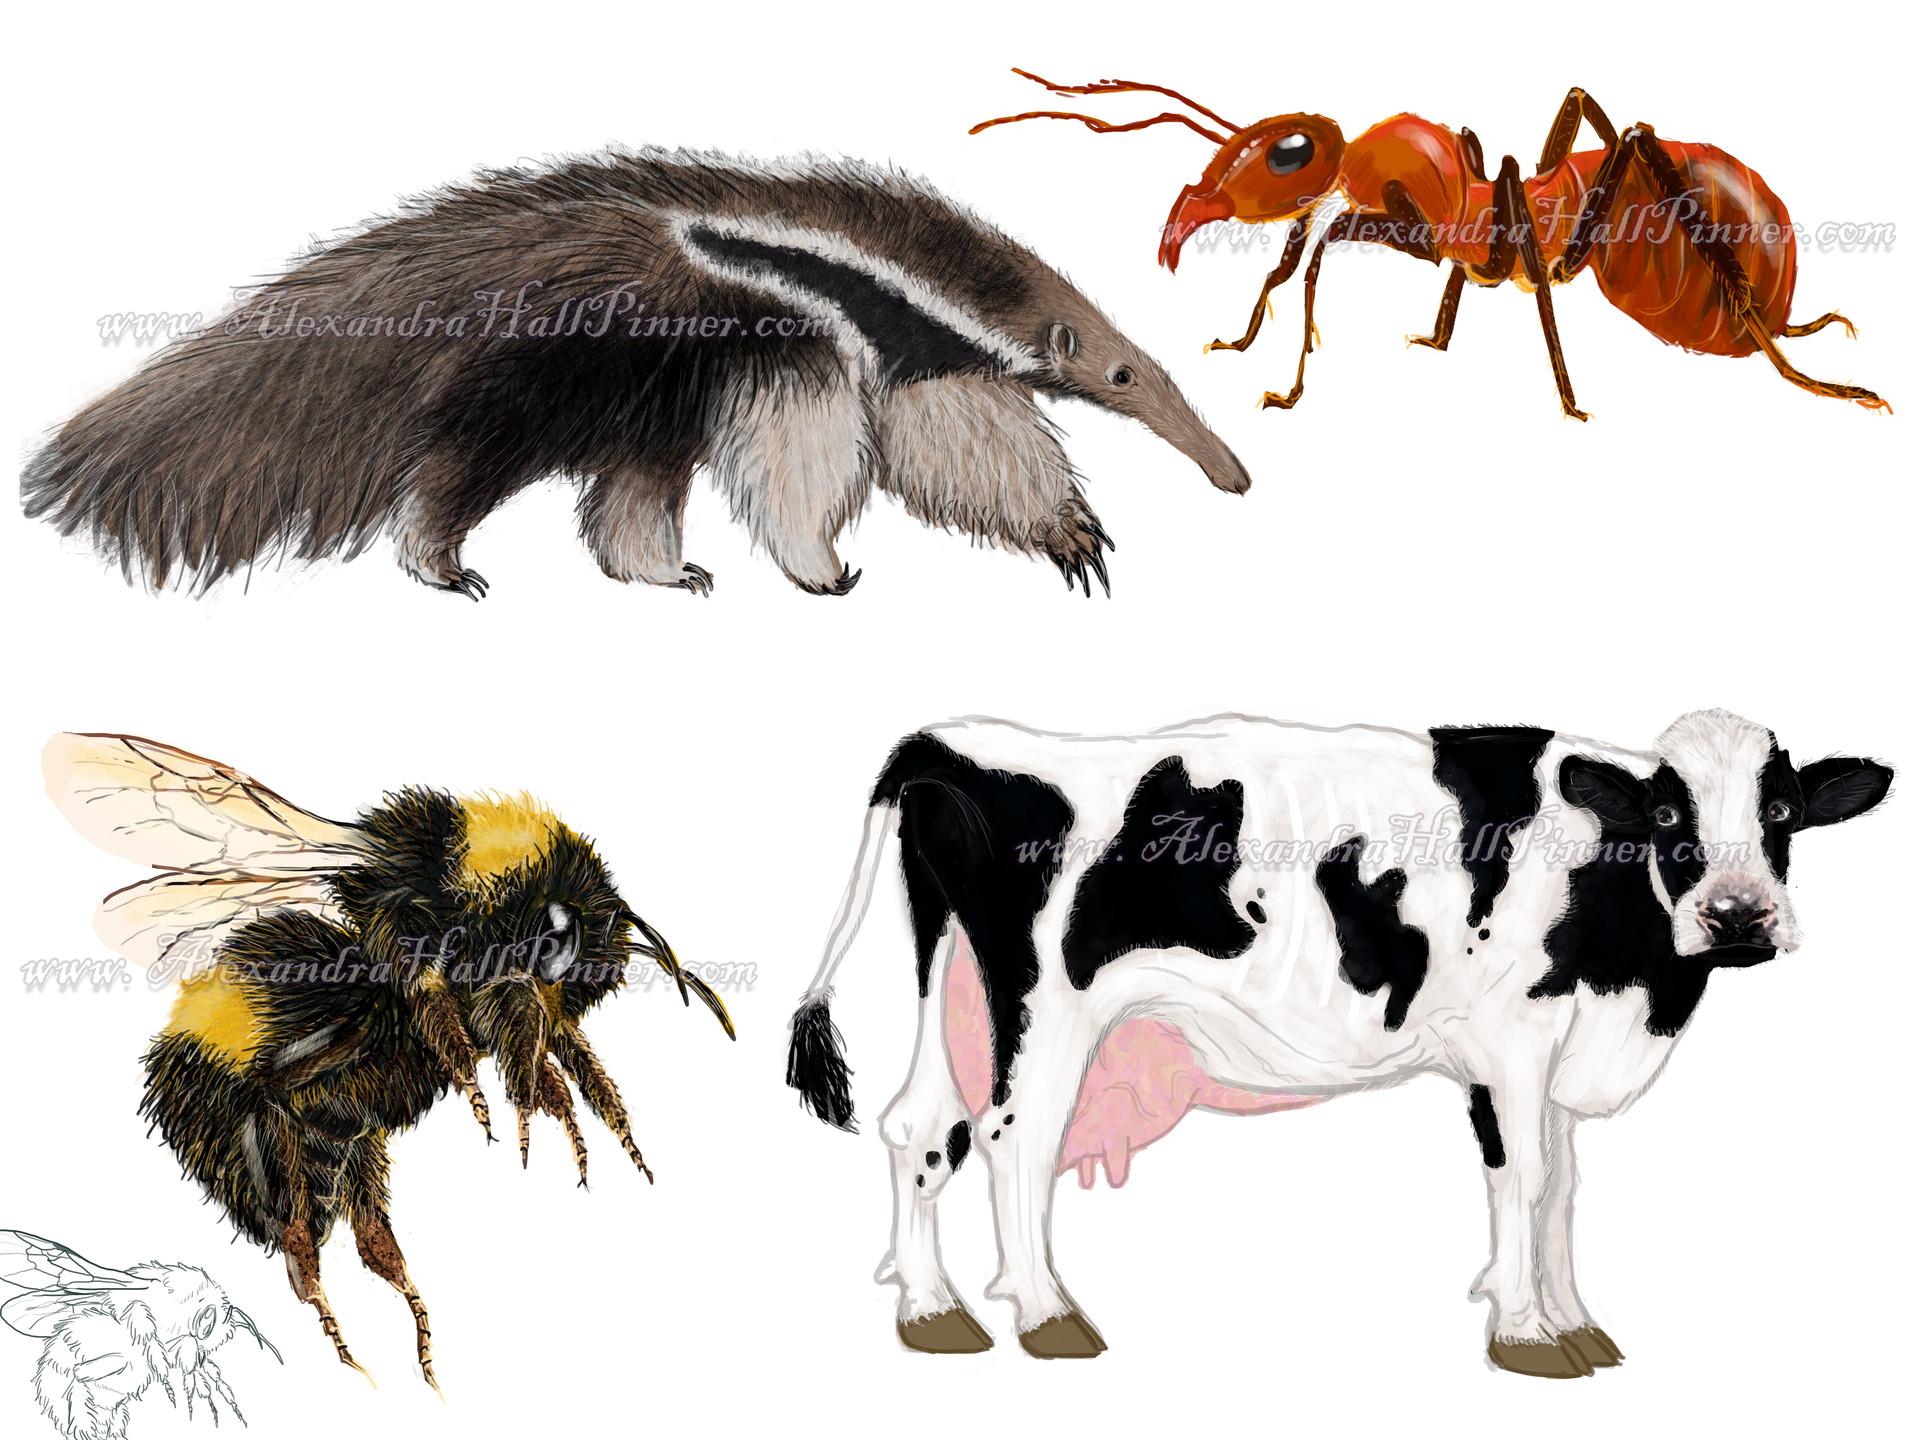 Alexandra hall pinner animals compile